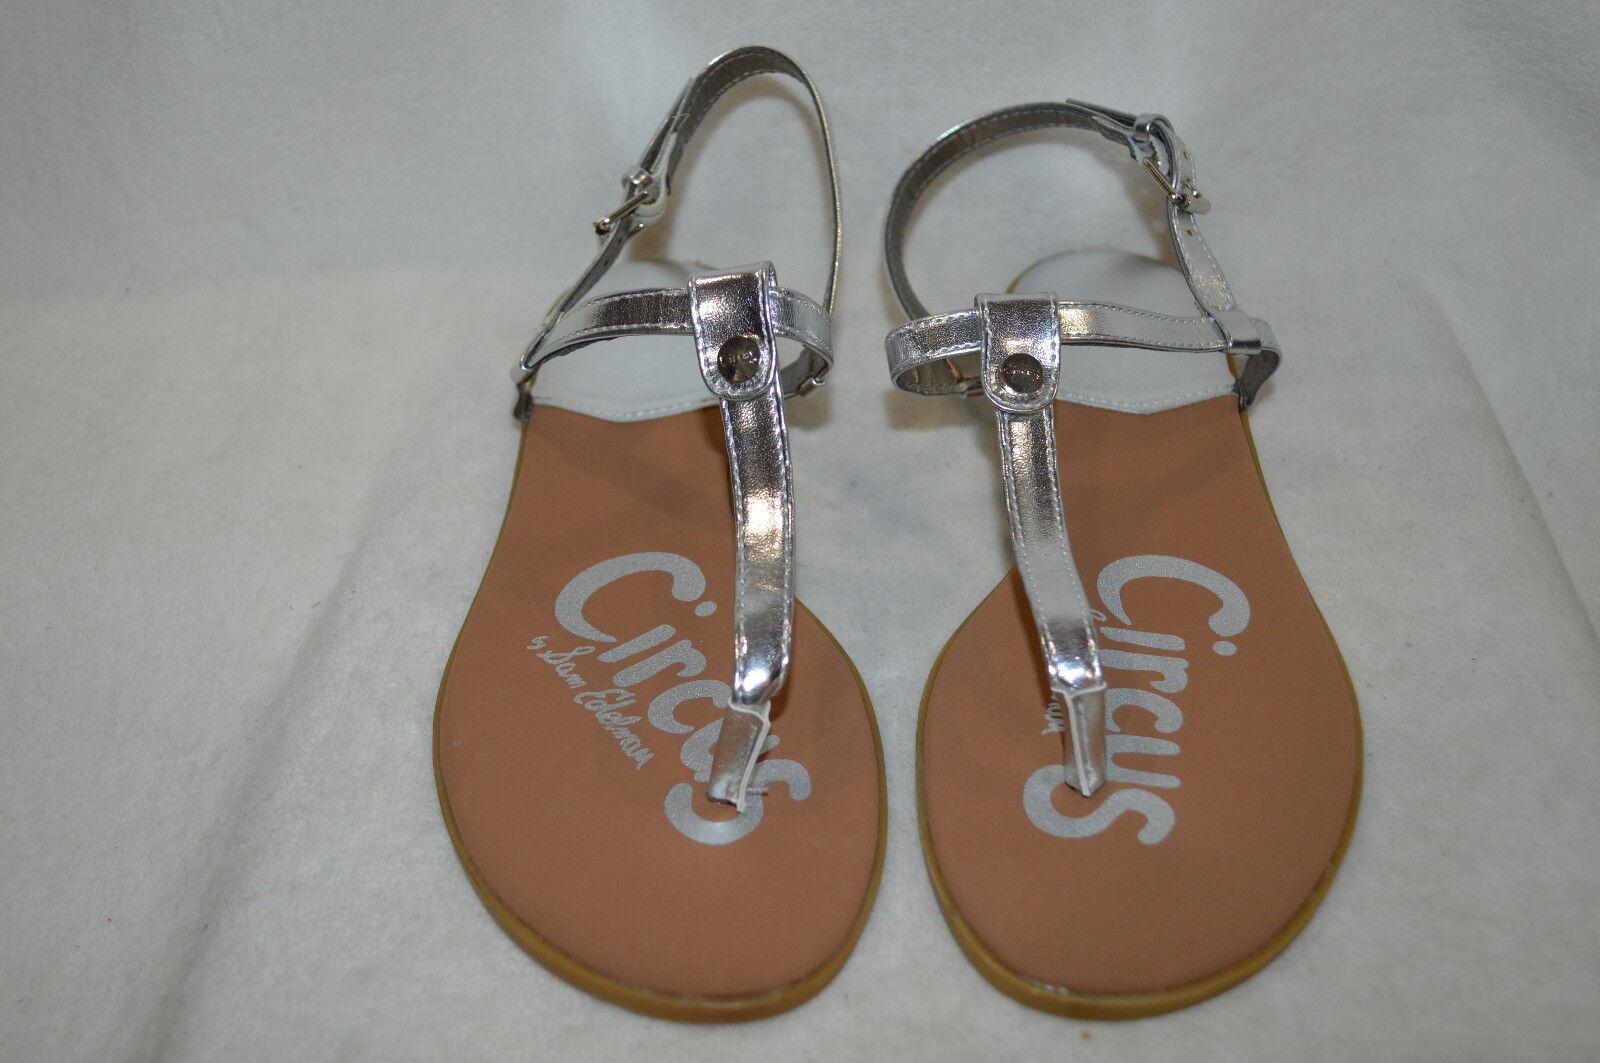 NIB Circus by Sam Edelman Cayden Girls Thong Sandals Silver MSRP$40